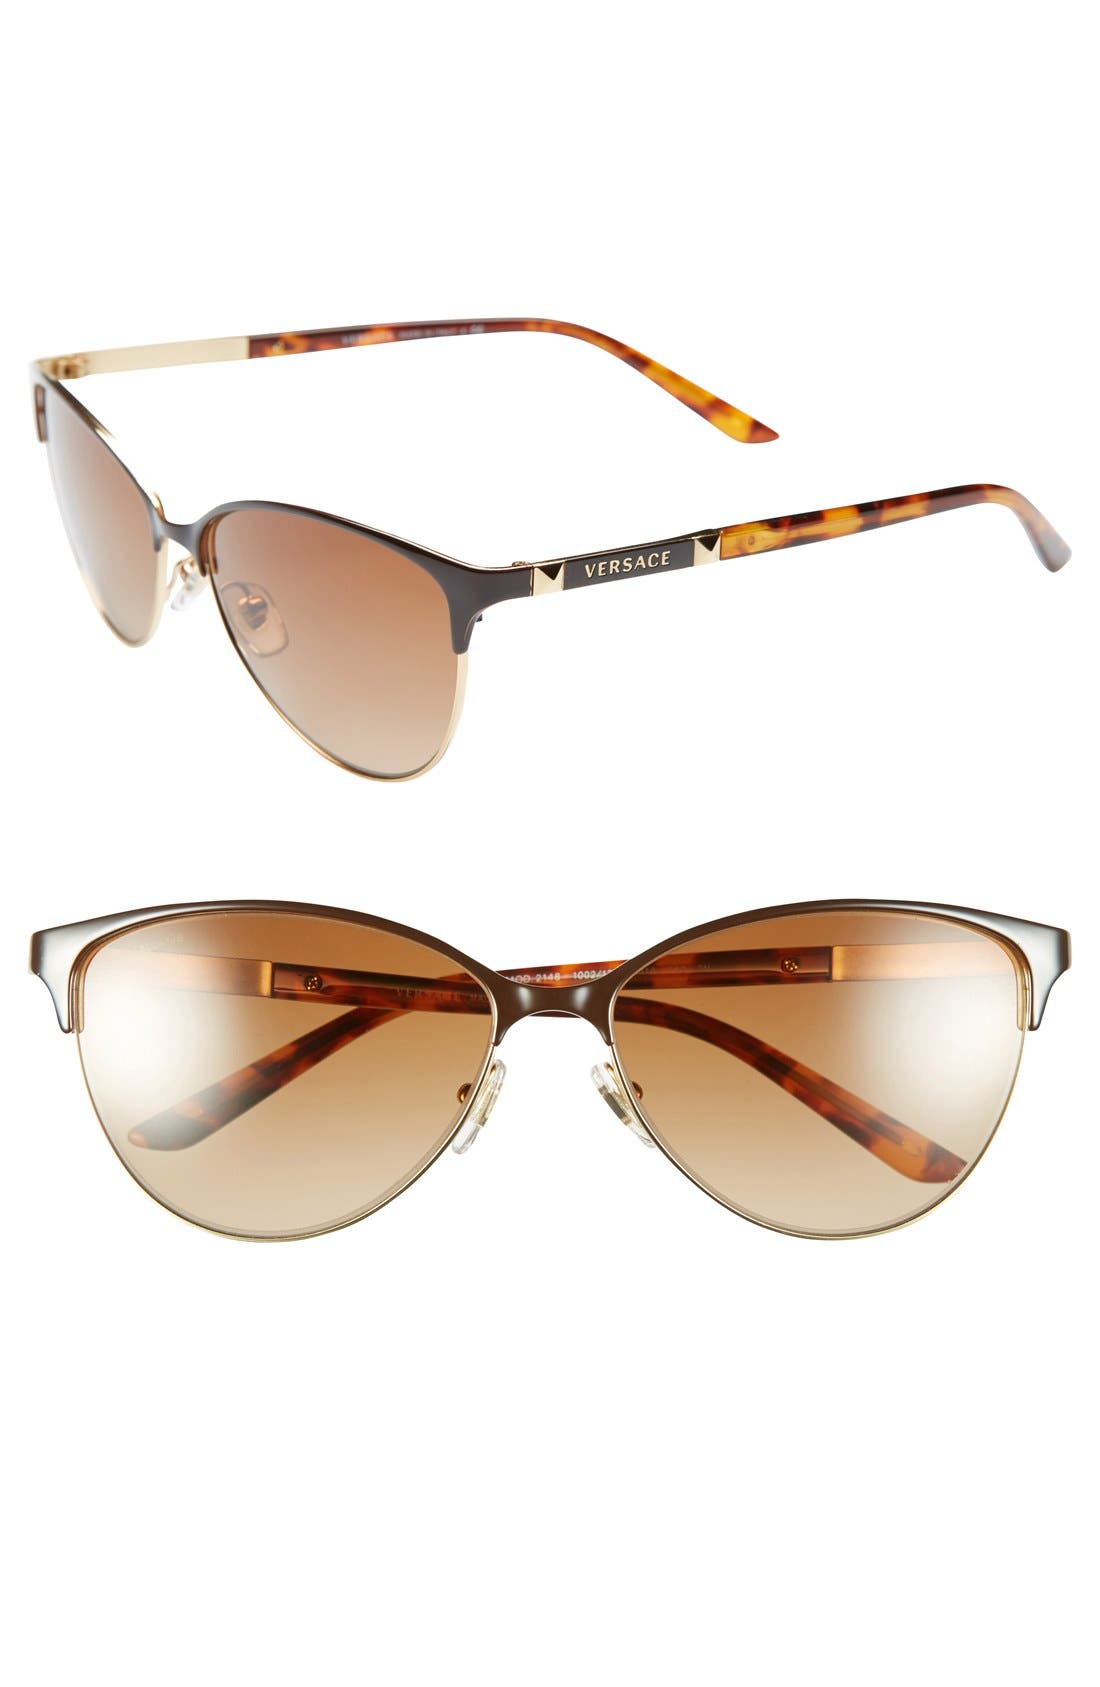 Alternate Image 1 Selected - Versace 57mm Cat Eye Sunglasses